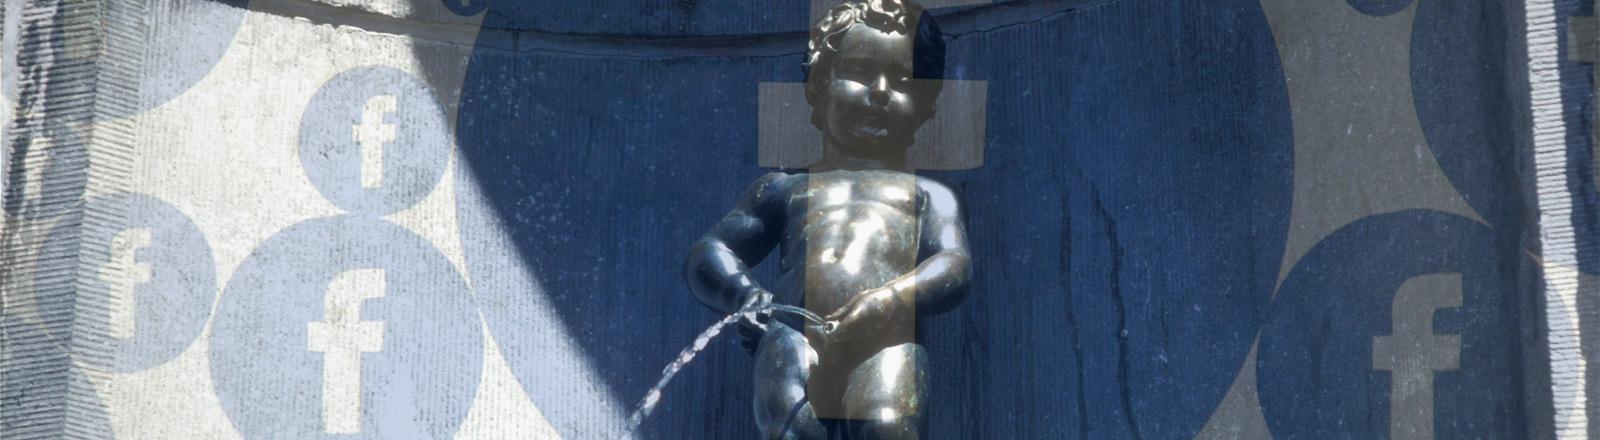 Symbolbild: Facebook-Urteil in Belgien